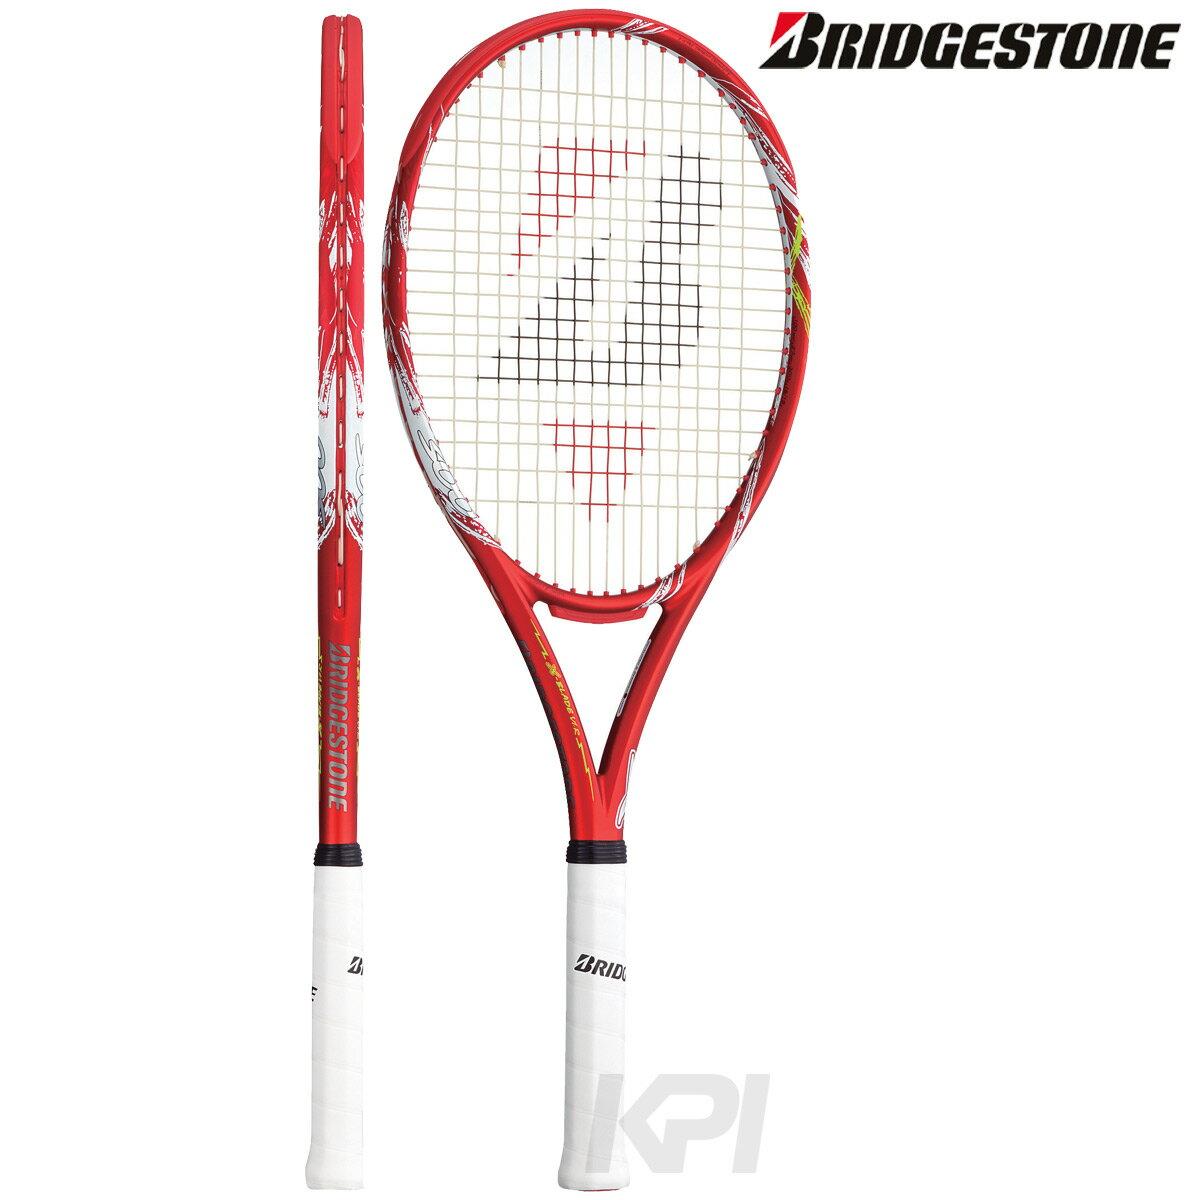 BRIDGESTONE(ブリヂストン)「X-BLADE VI-R300(エックスブレードブイアイR300) BRAV64」硬式テニスラケット【prospo】